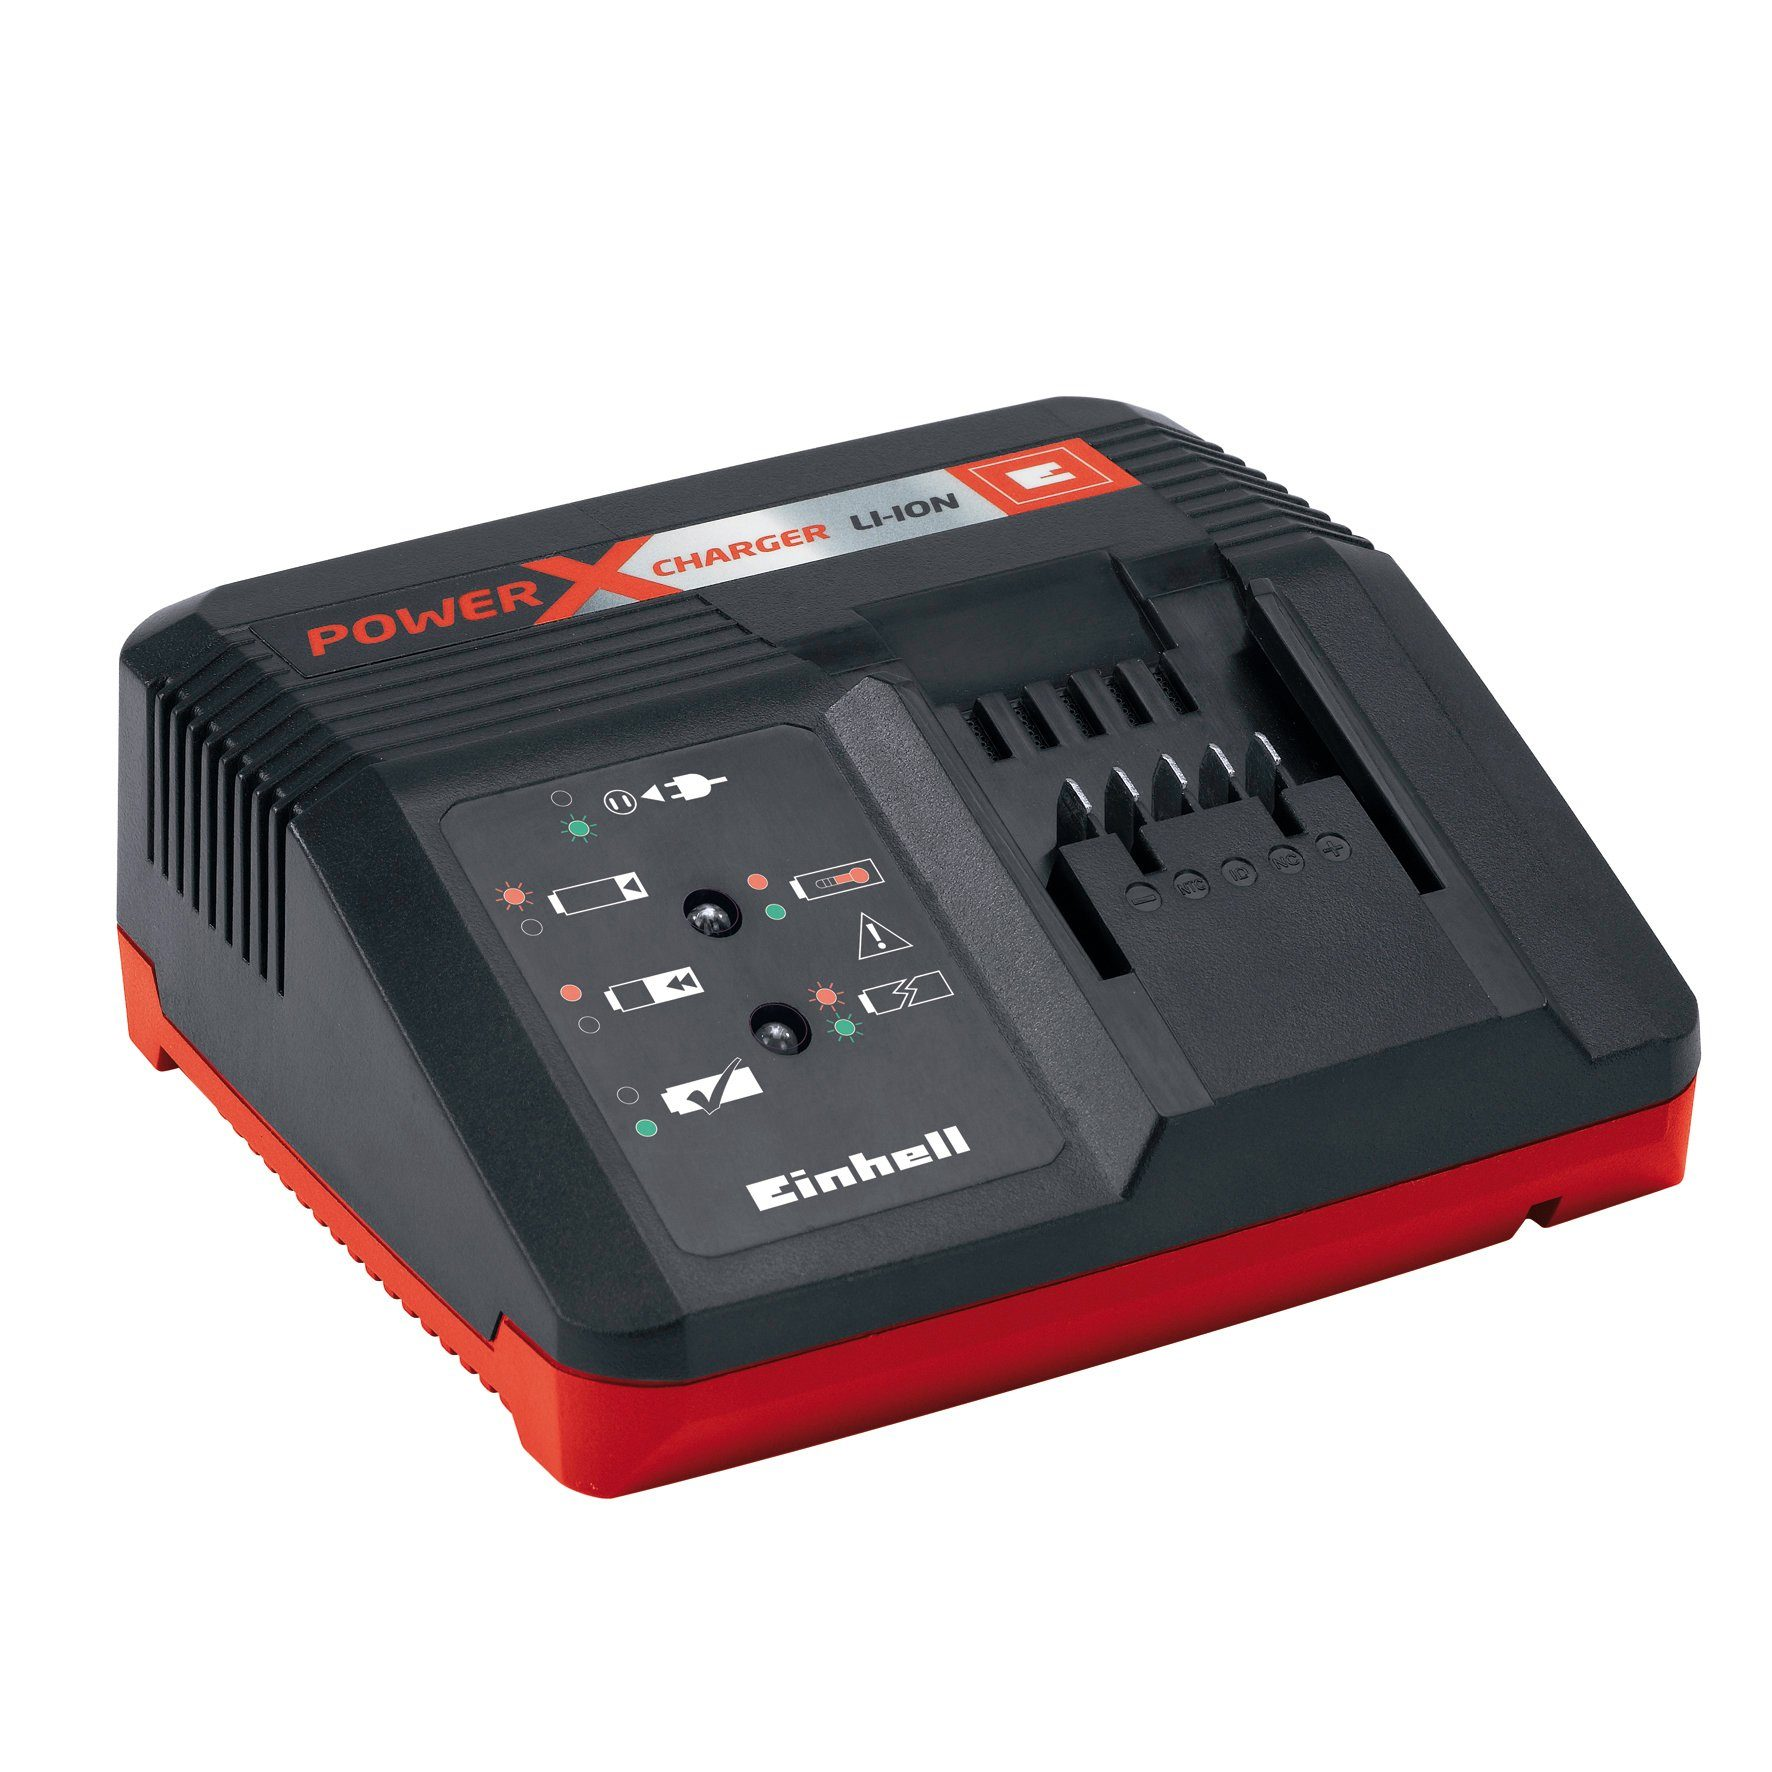 EINHELL Akkuladestation »Power-X-Charger «, 18V, 30min